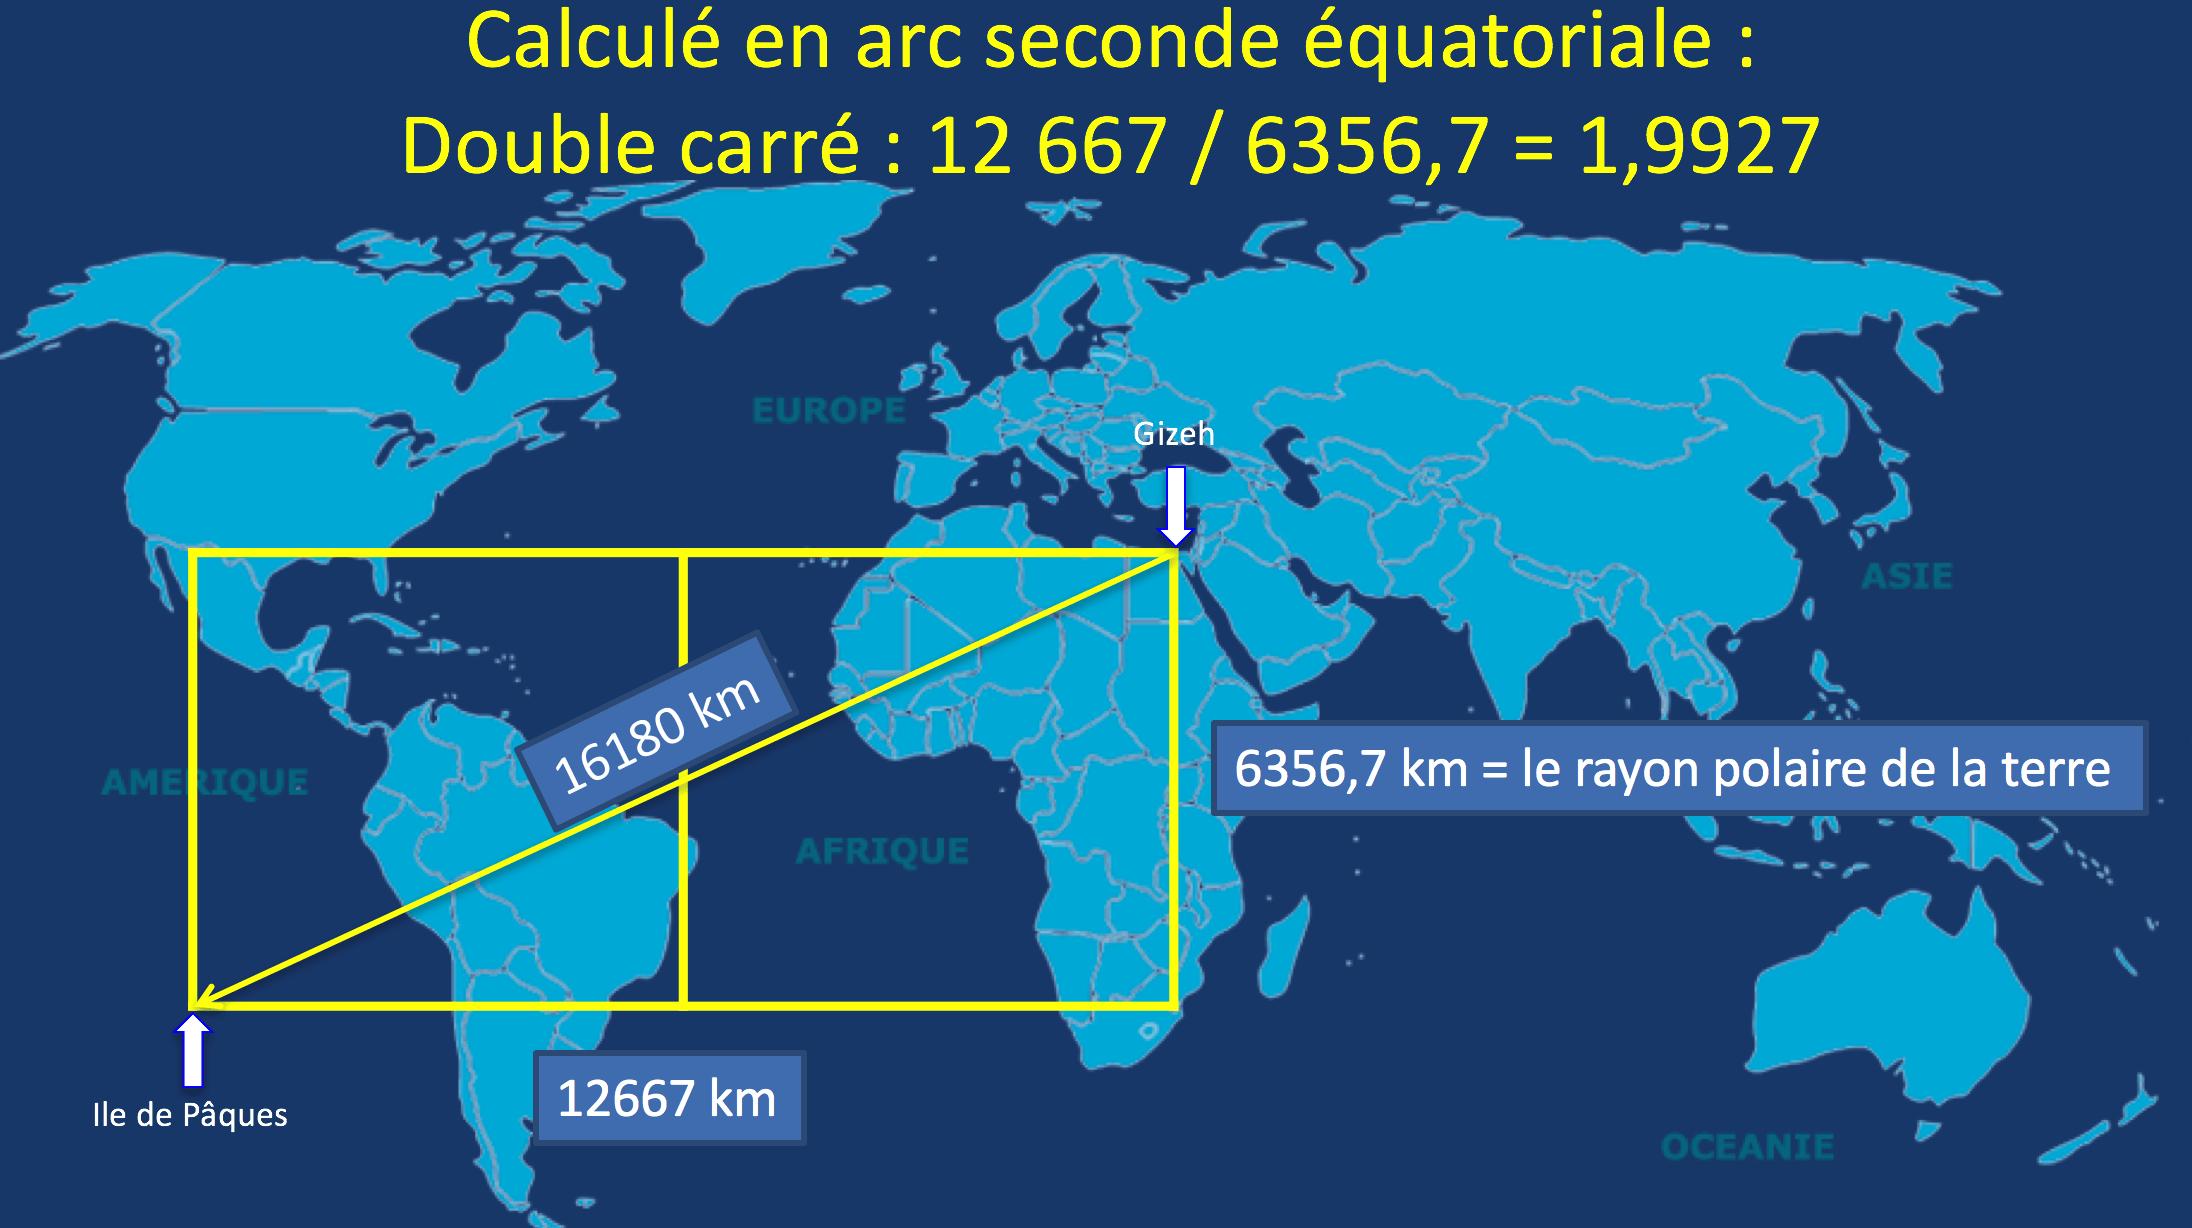 2017-04-28 15:39:17